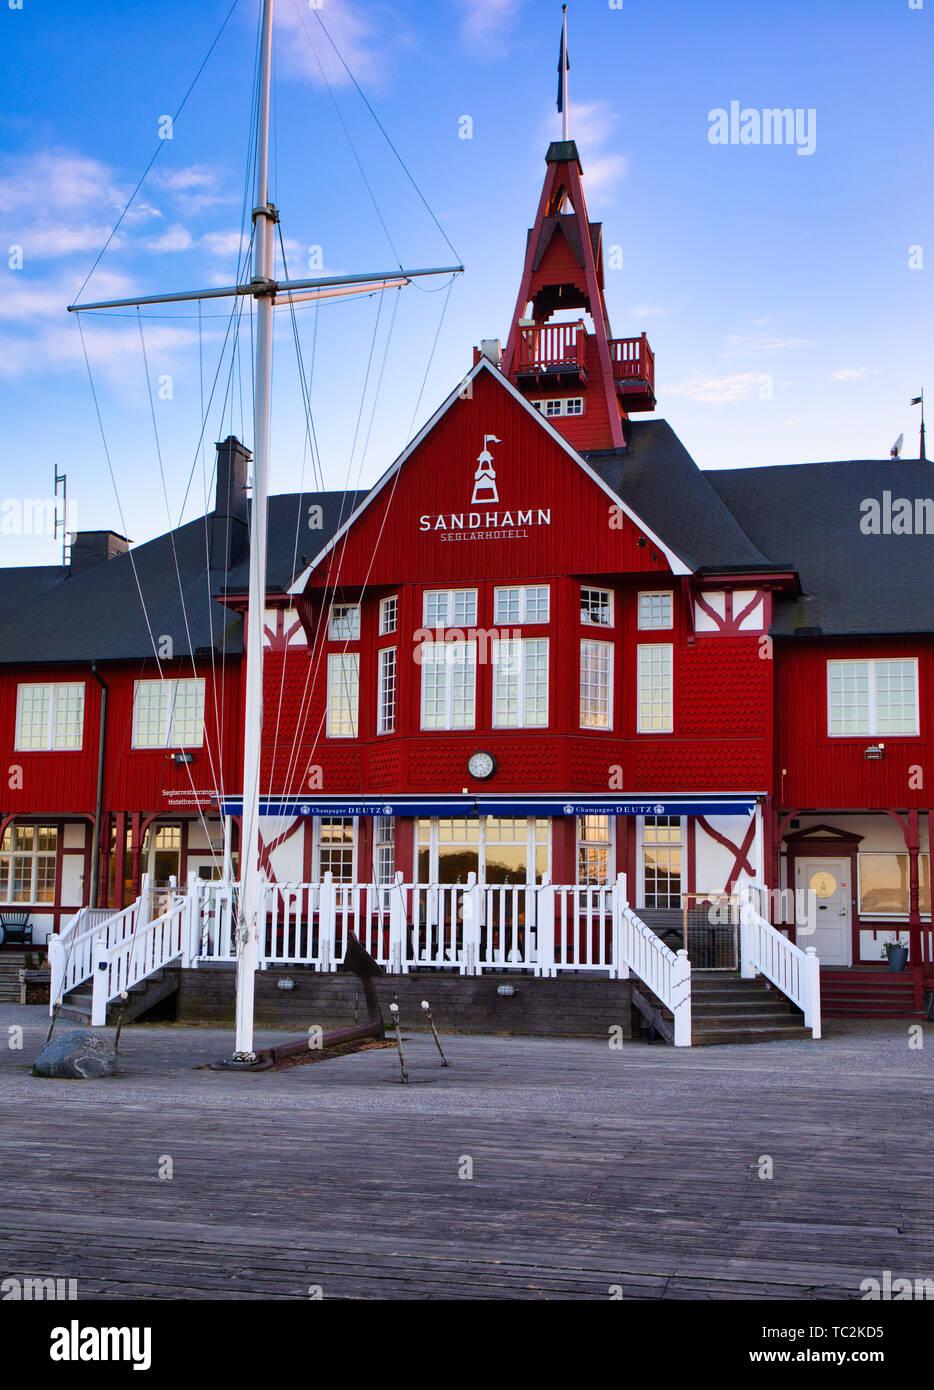 Sandhamn Seglarhotell,Sandhamn island, Stockholm archipelago, Sweden, Scandinavia - Stock Image